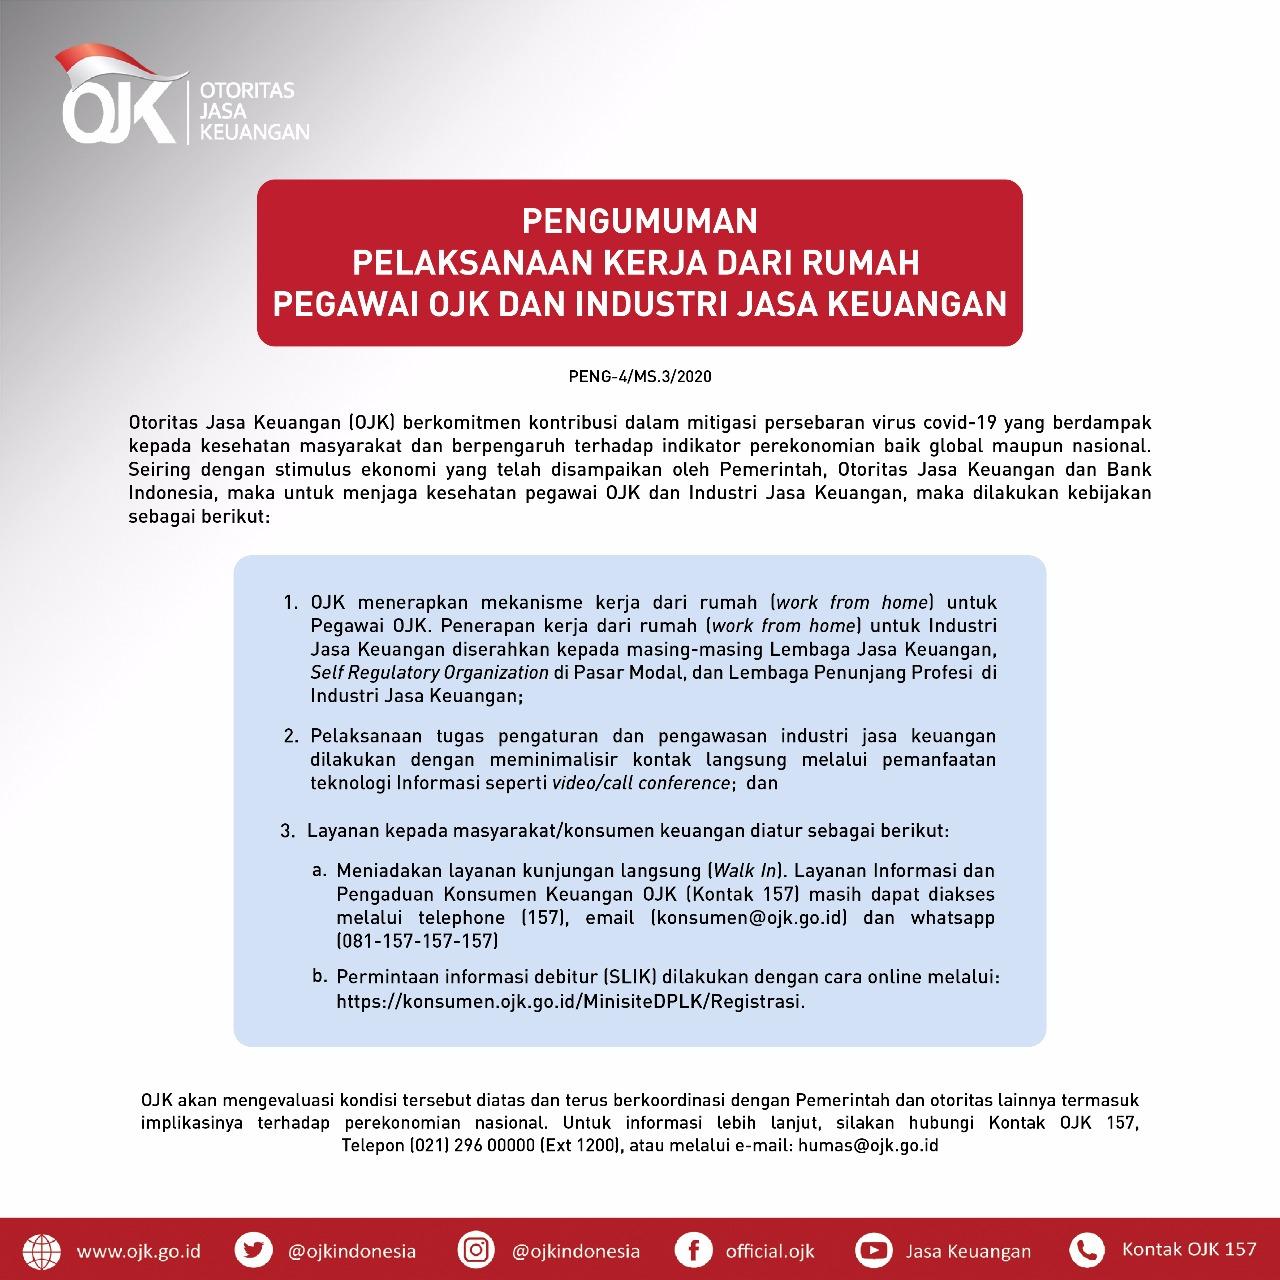 Ojk Indonesia On Twitter Sobat Ojk Untuk Mencegah Penyebaran Virus Corona Yang Berdampak Pada Kesehatan Masyarakat Ojk Mengeluarkan Kebijakan Bekerja Dari Rumah Untuk Menjaga Kesehatan Pegawai Ojk Dan Industri Jasa Keuangan Selengkapnya